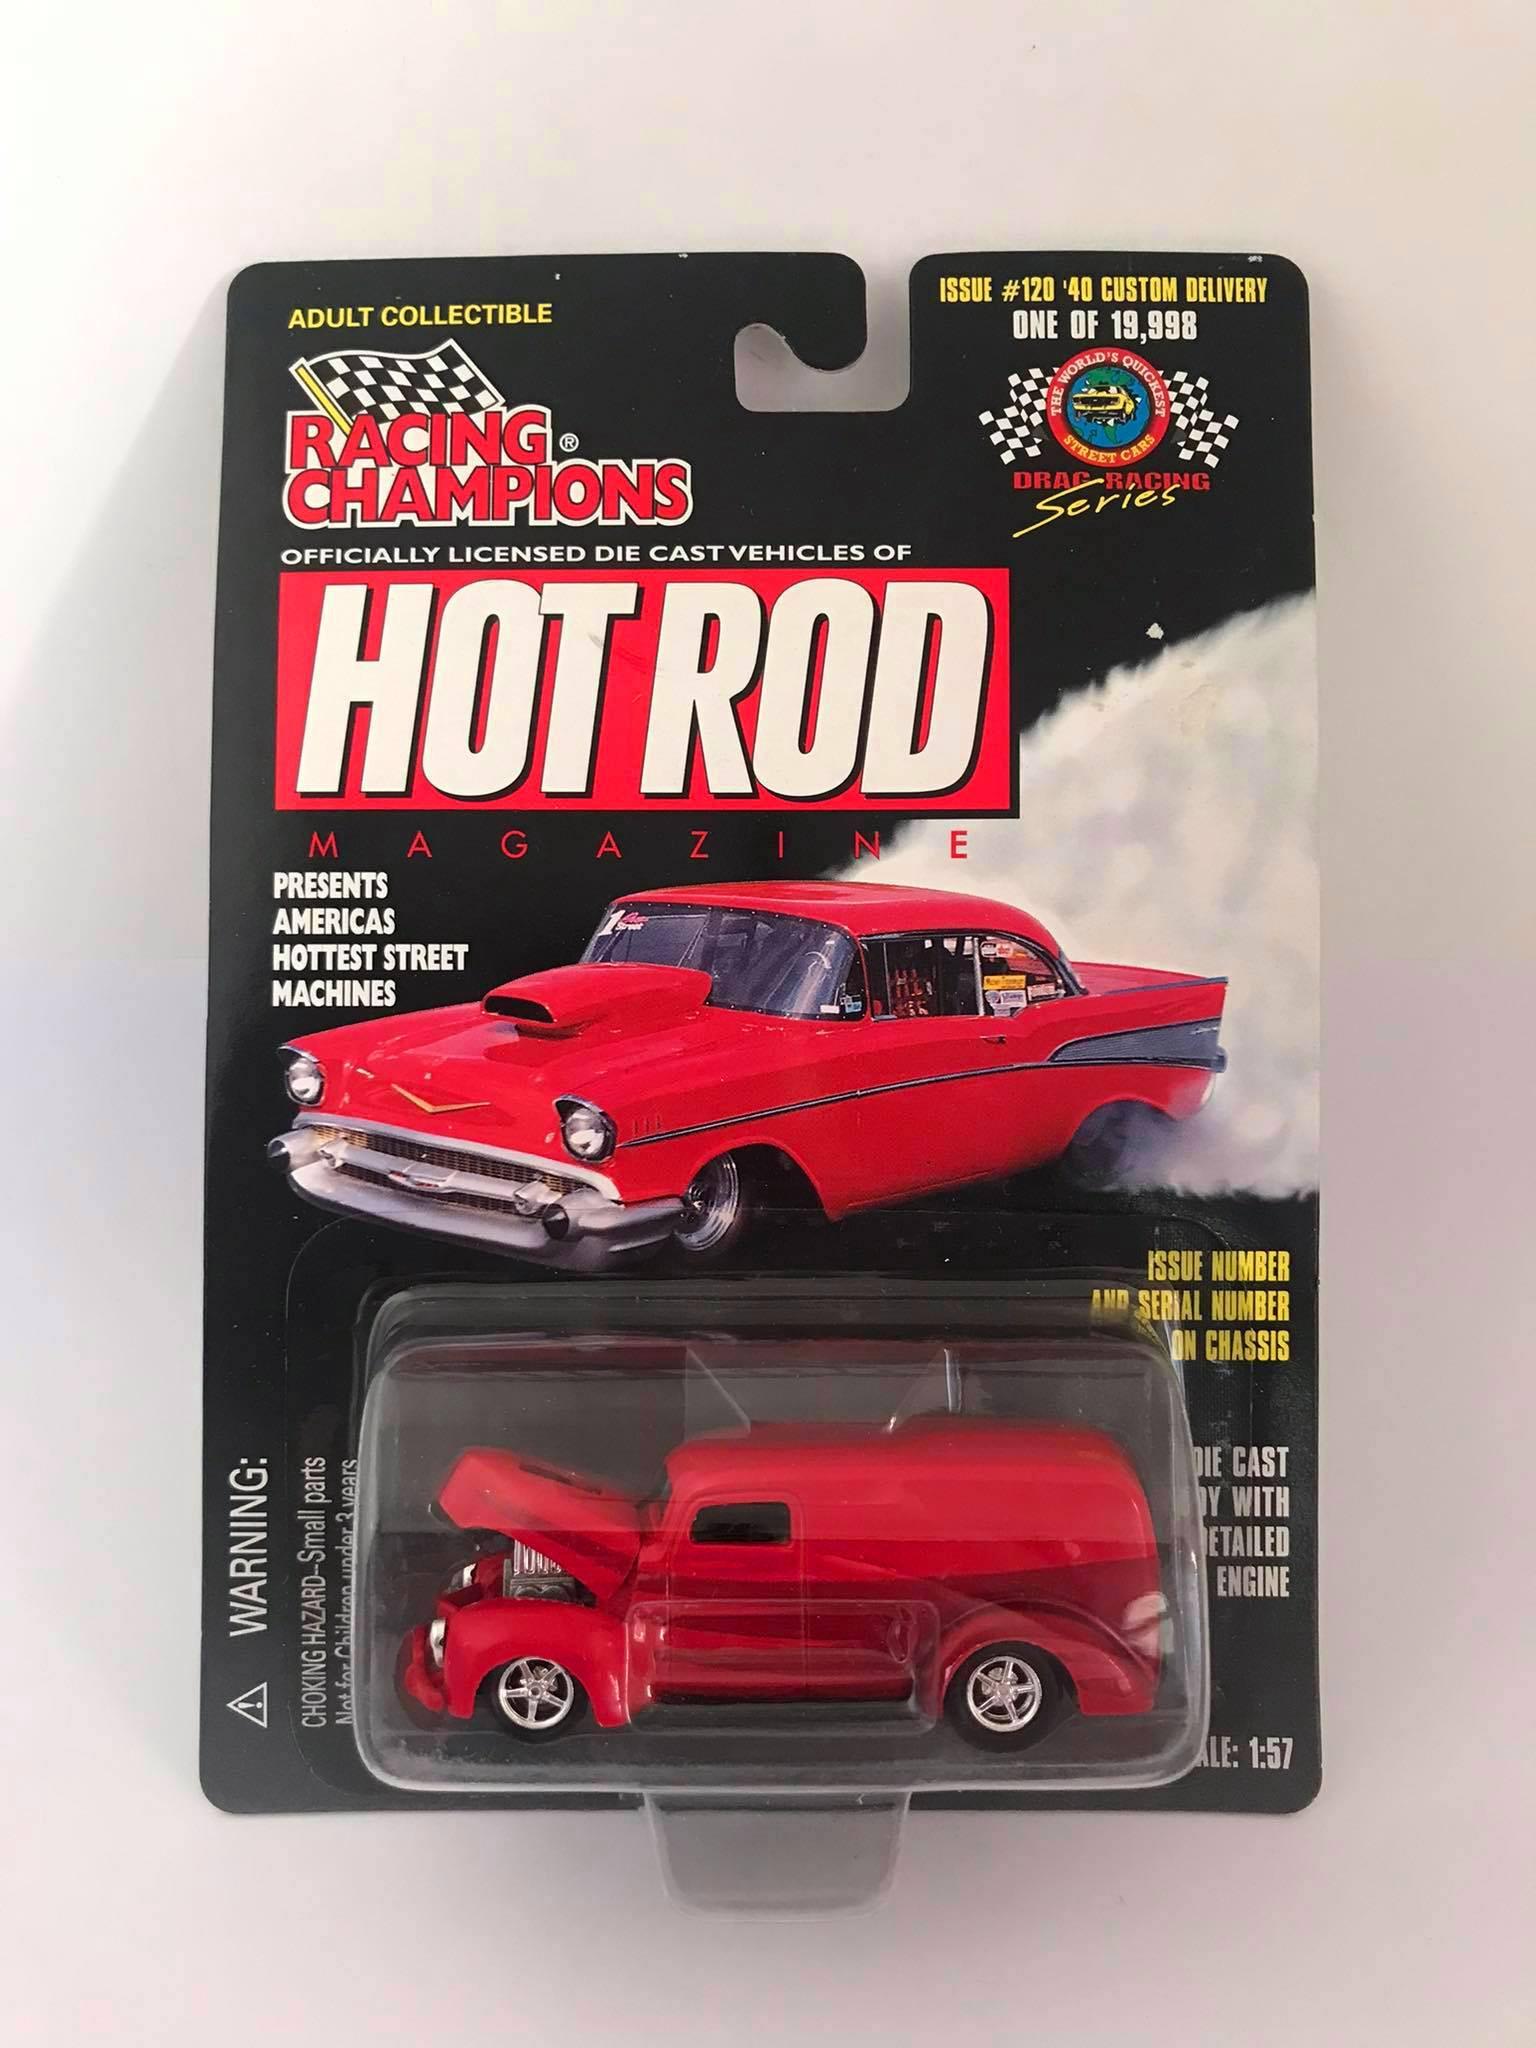 Racing Champions  - 40 Custom Delivery Vermelho - Hot Rod Magazine - Drag Racing Series